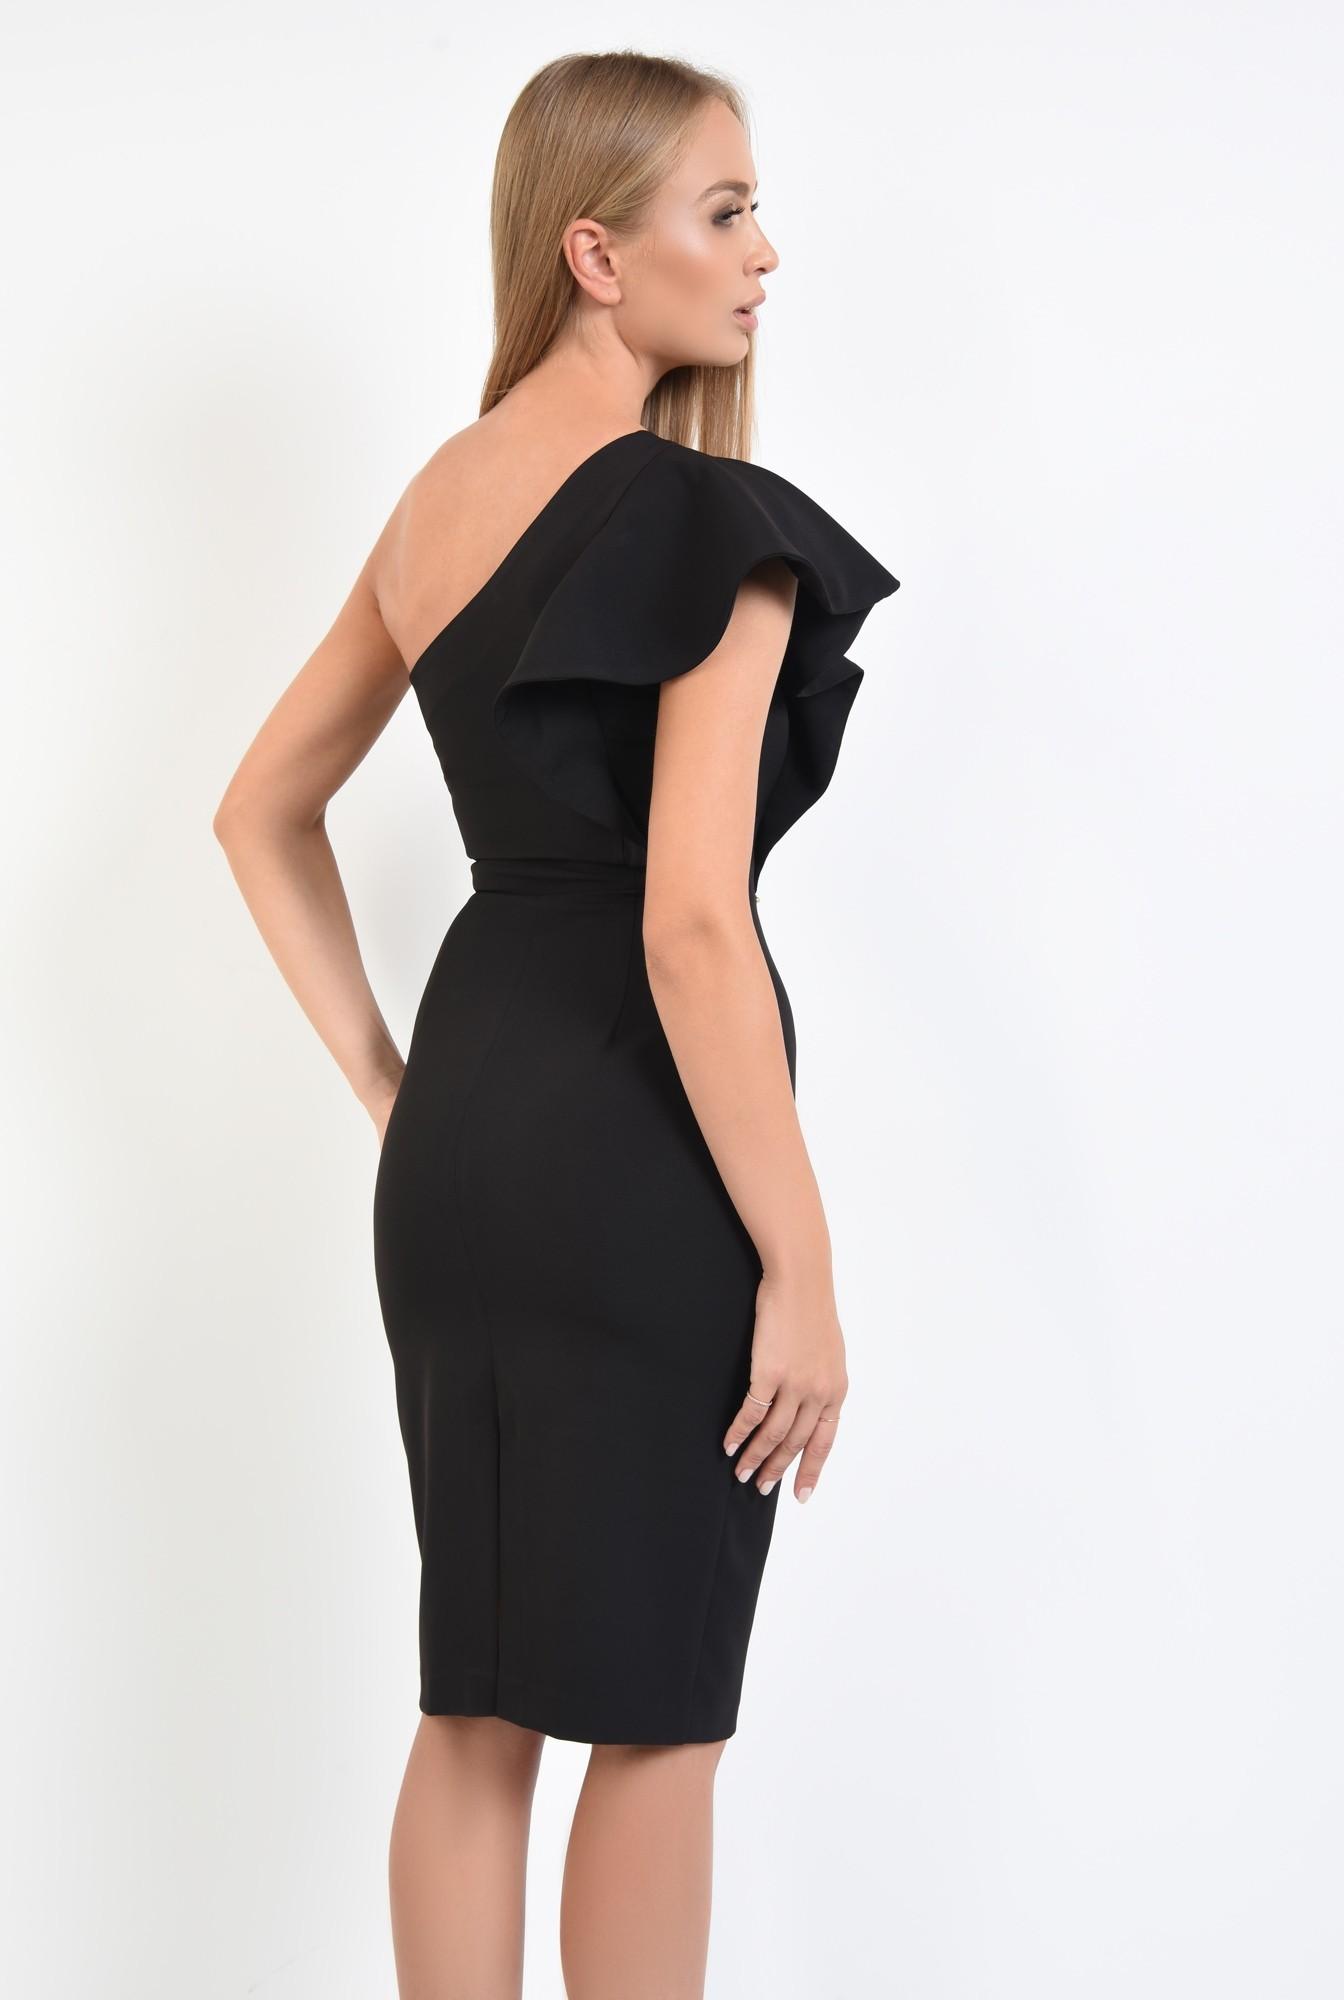 1 - rochie neagra, de seara, volan la umar, rochii online